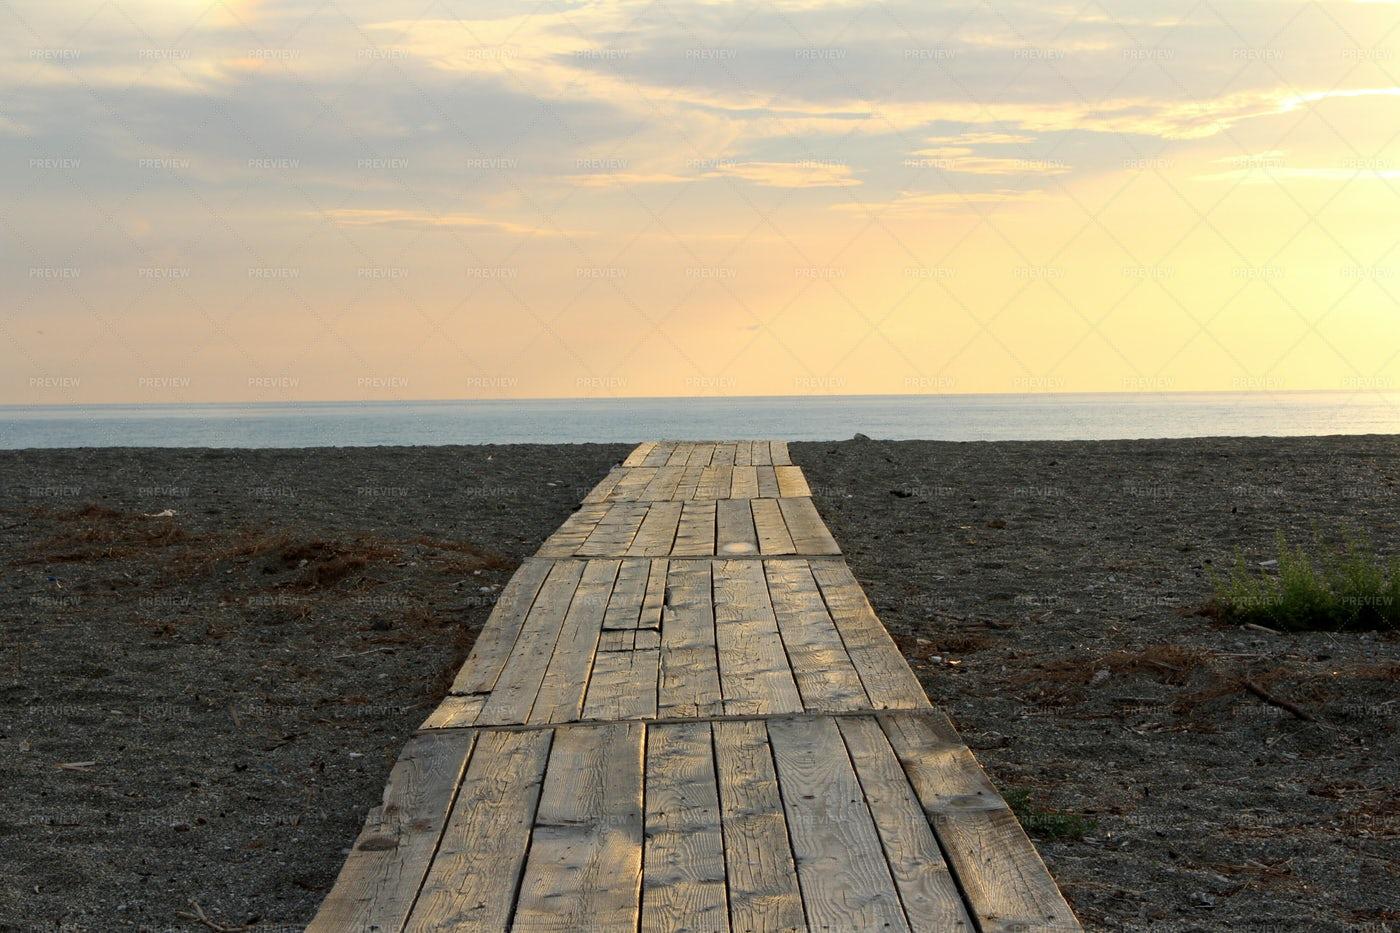 Footbridge In The Sea: Stock Photos